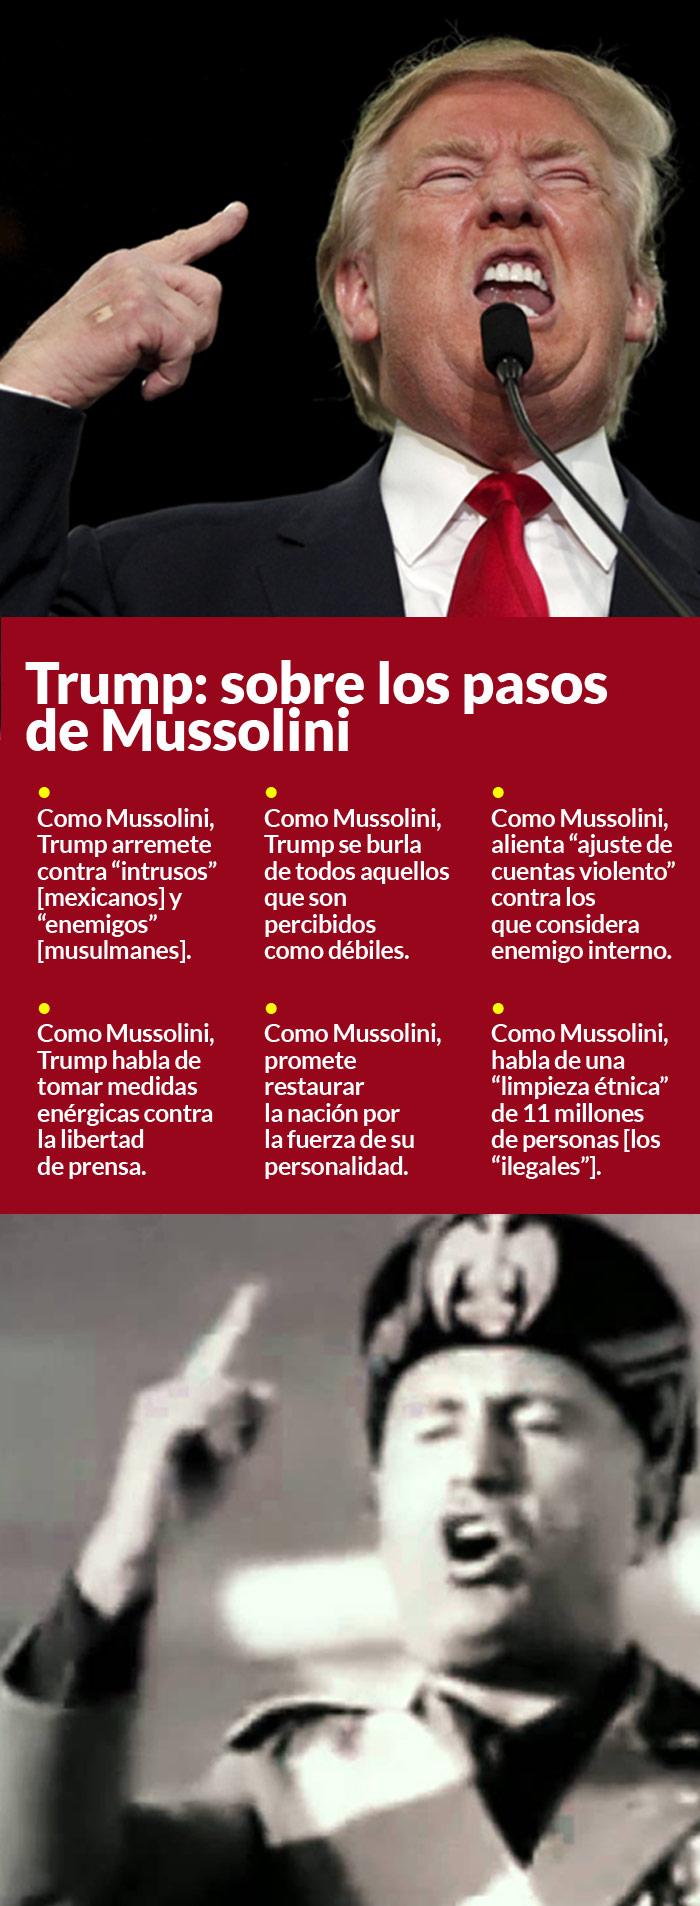 Trump-y-Mussolini-700